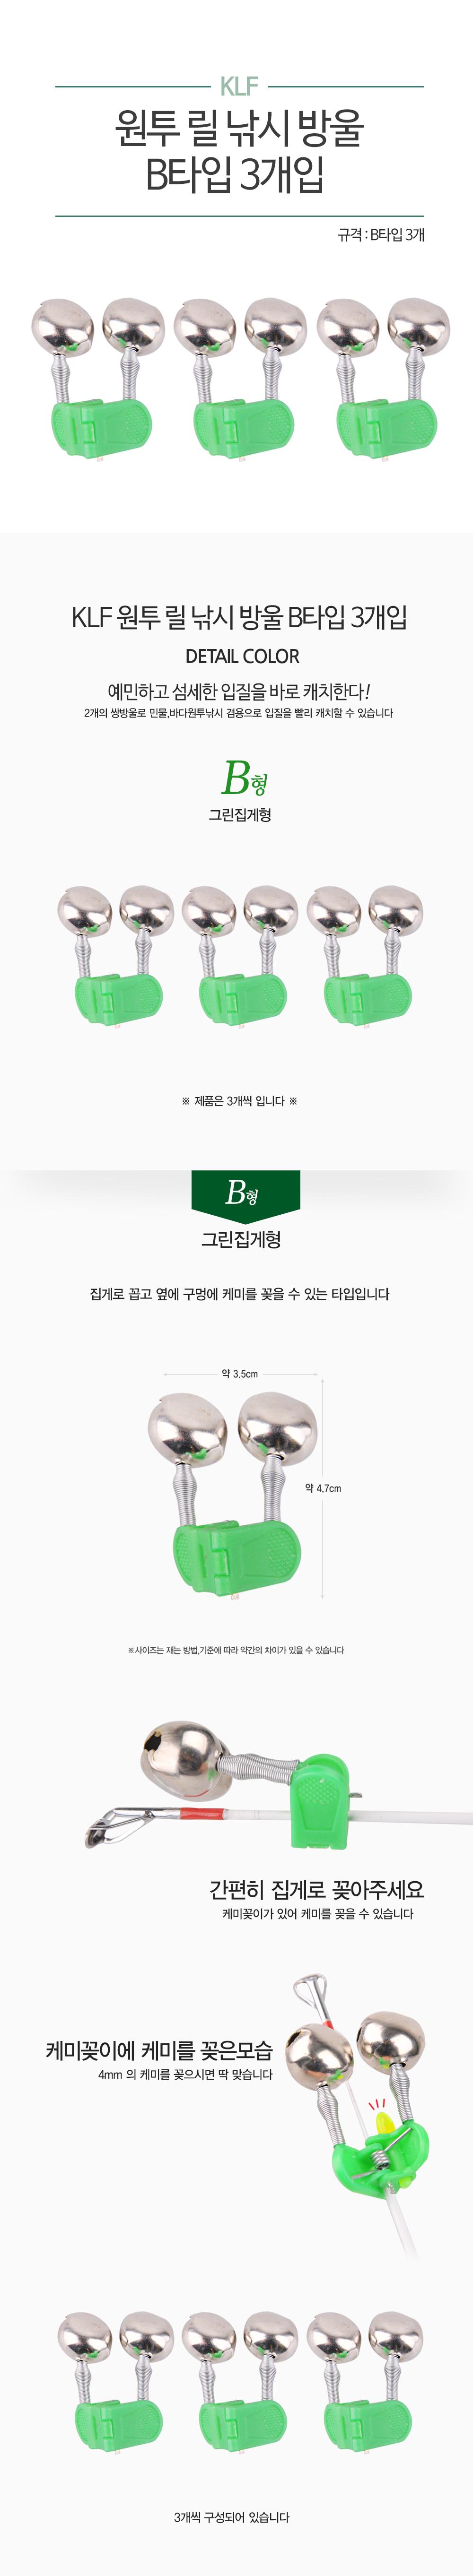 KLF 원투 릴 낚시 방울 B타입 3개입 릴방울 원투낚시방울 릴낚시방울 초릿대방울 방울 딸랑이